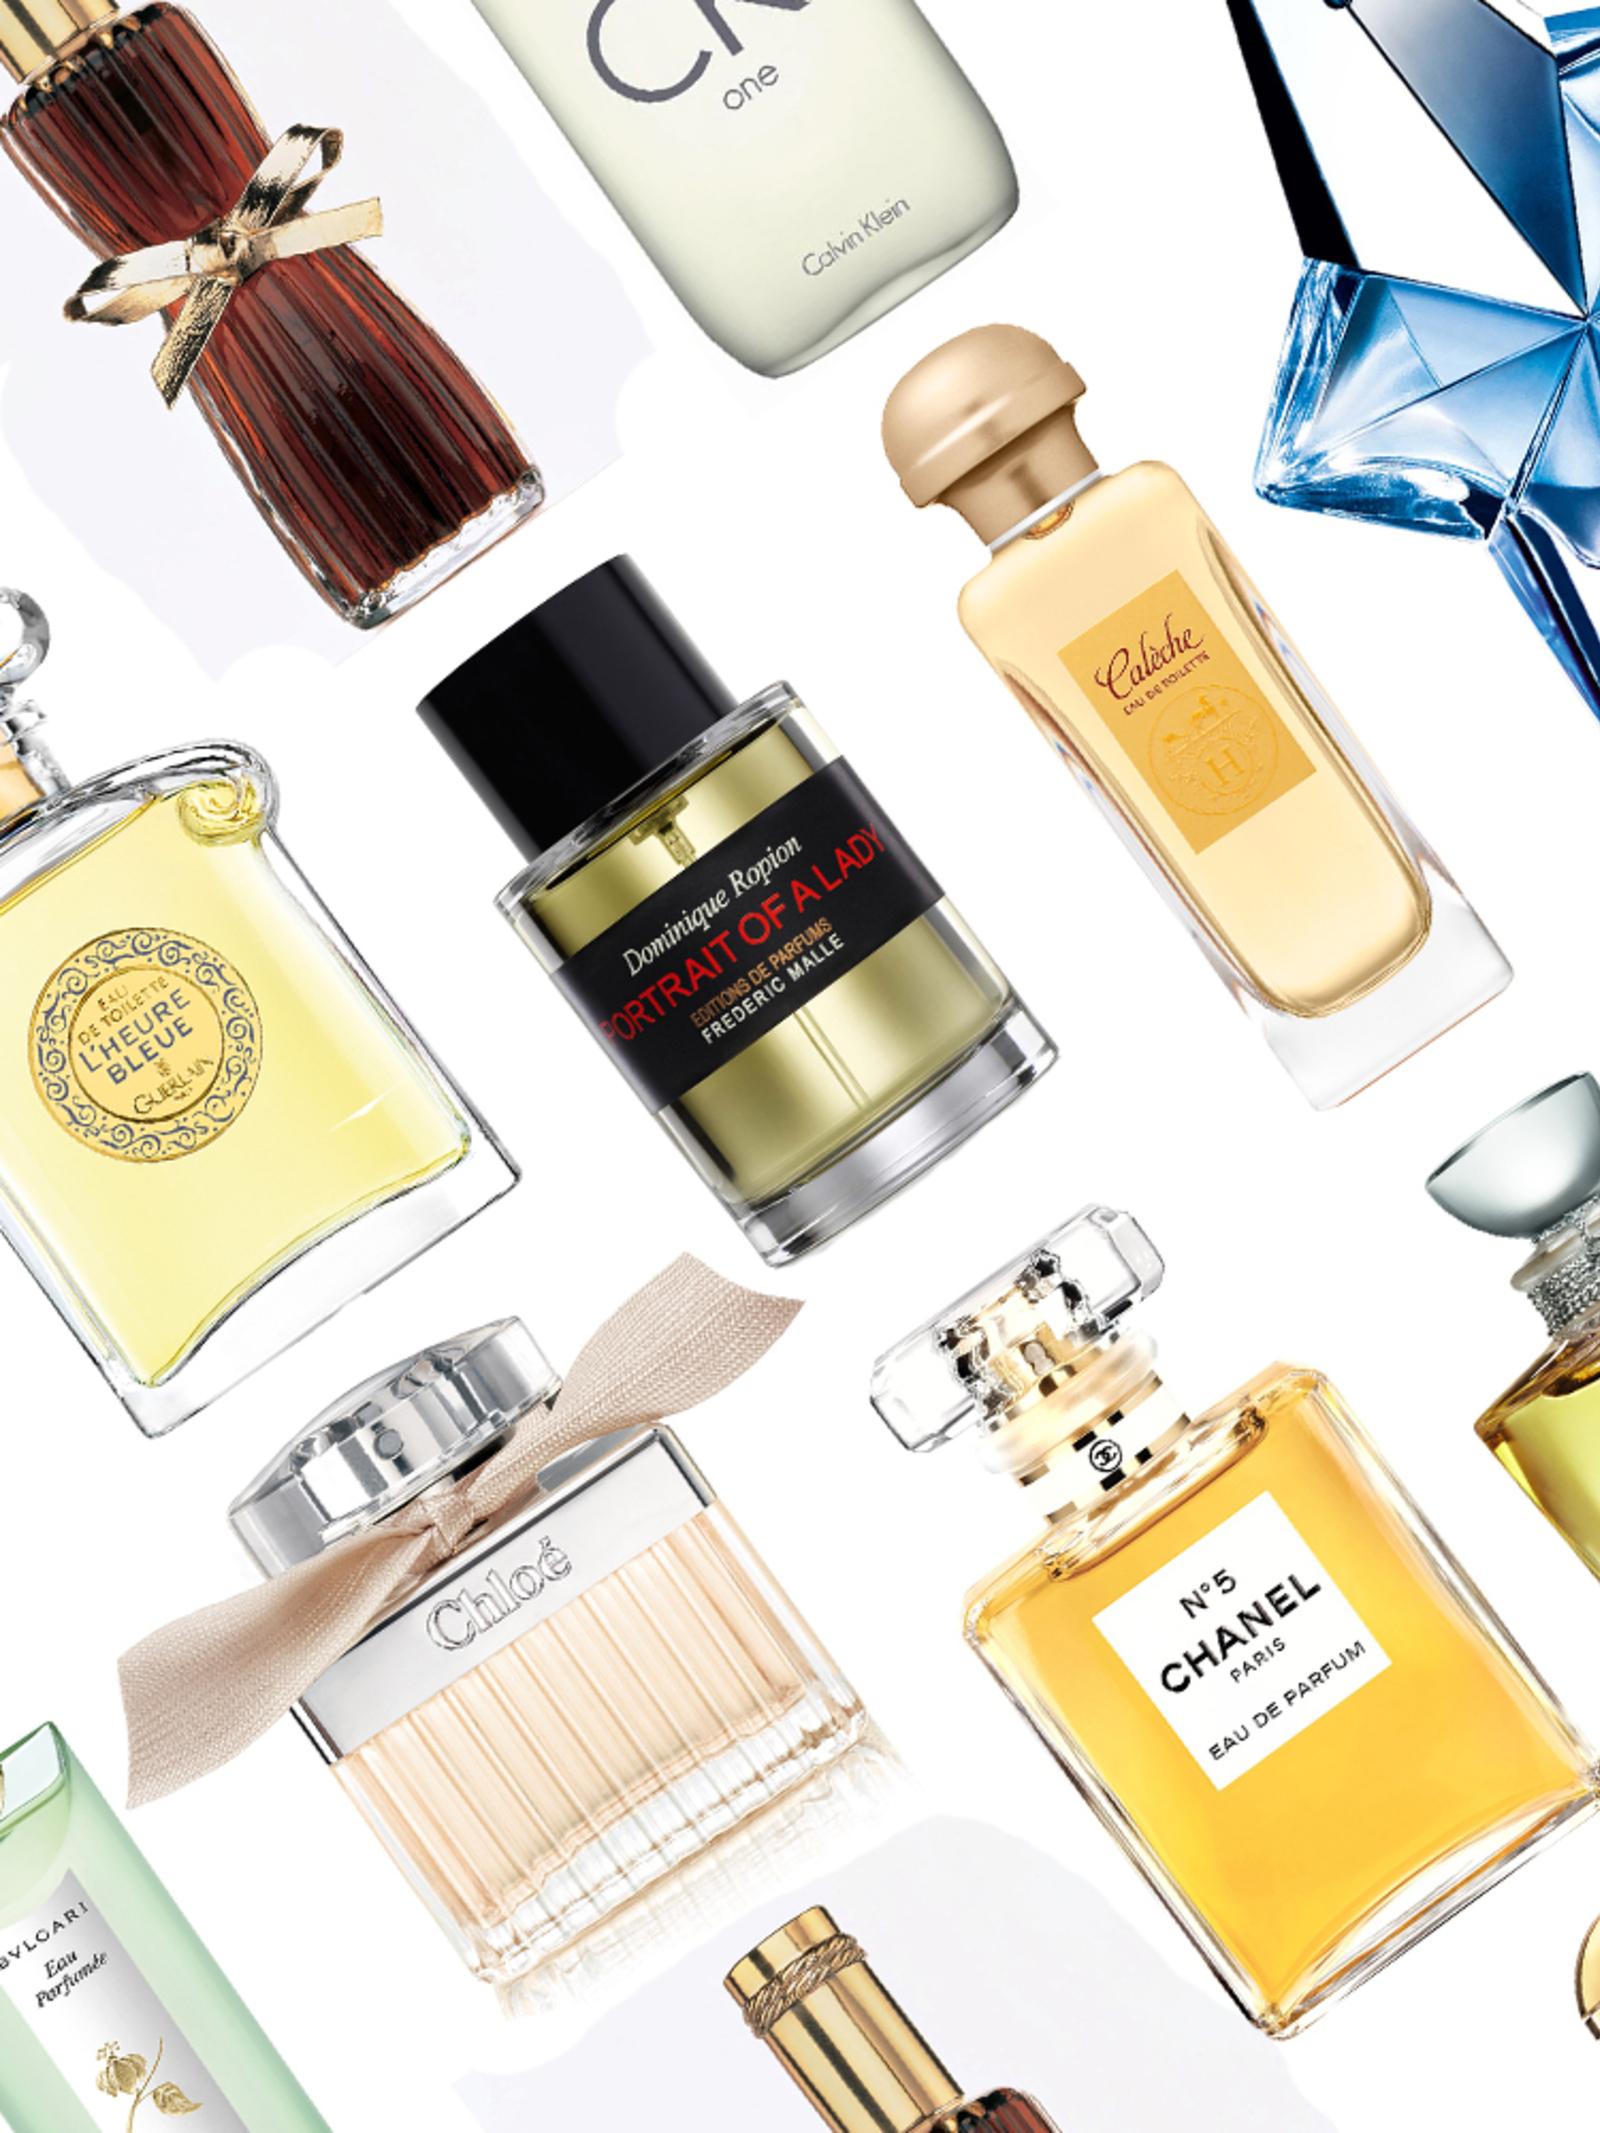 designer parfums ltd 57av  designer parfums ltd